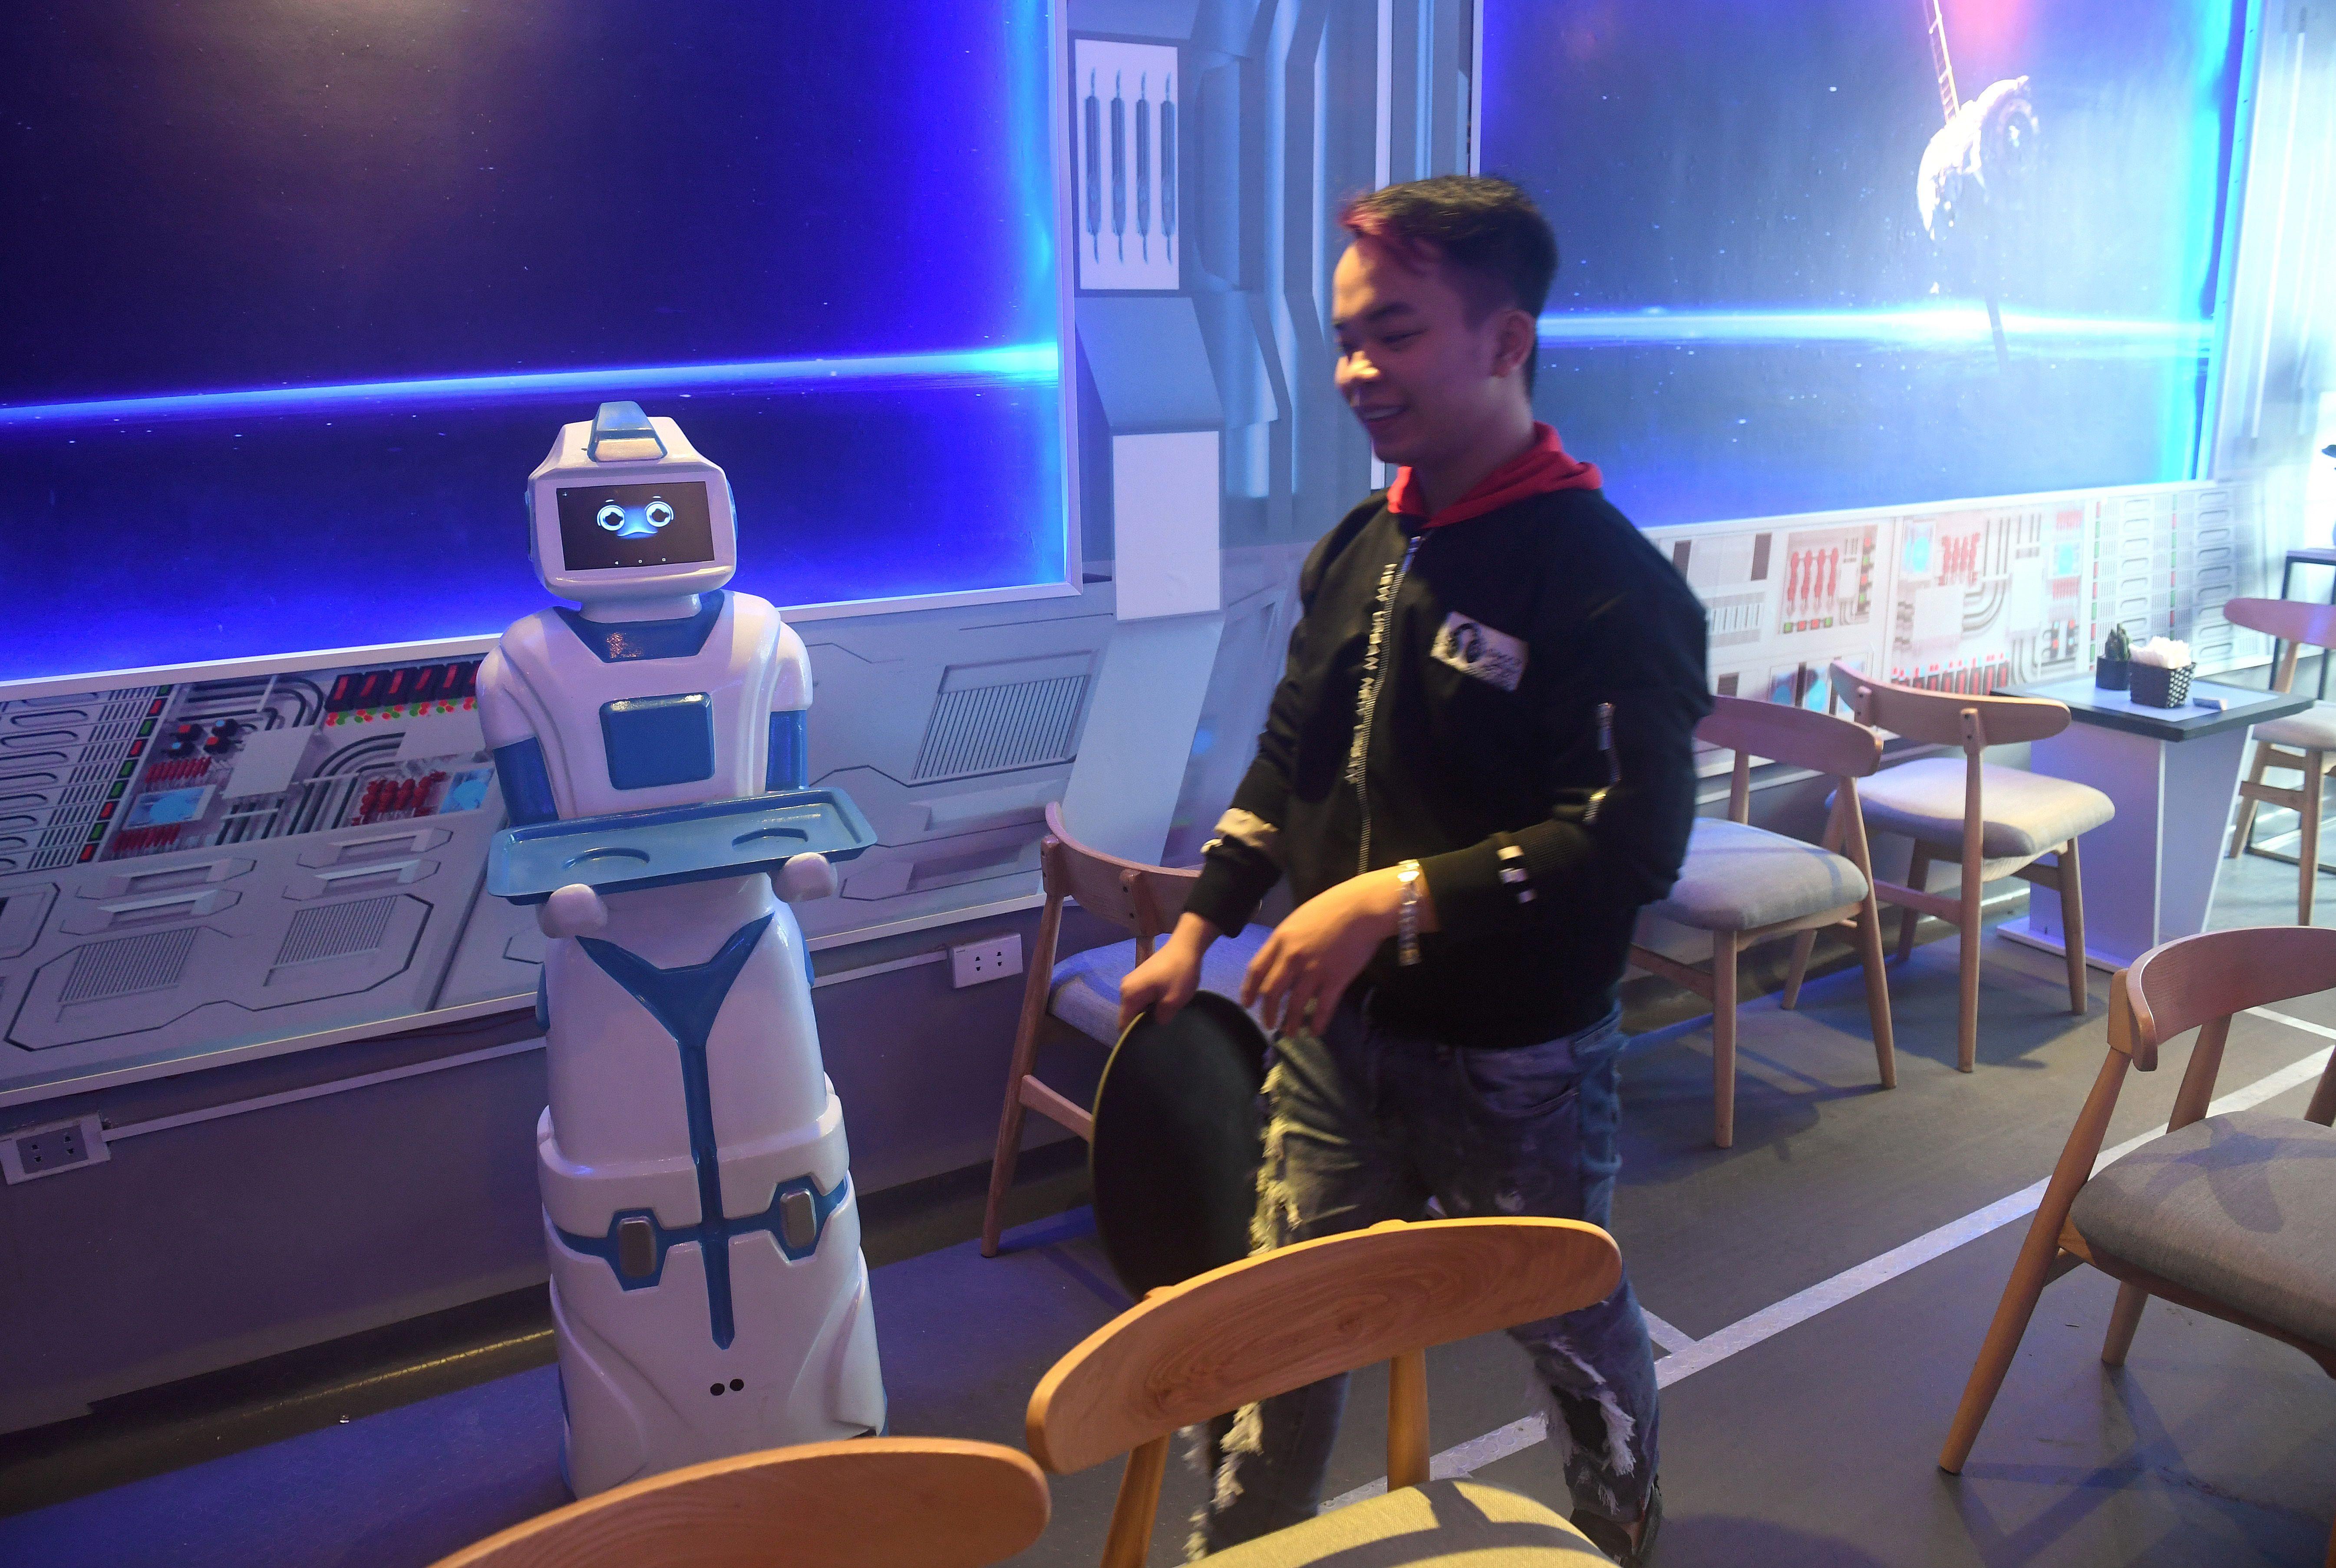 VIETNAM-LIFESTYLE-TECHNOLOGY-ROBOT